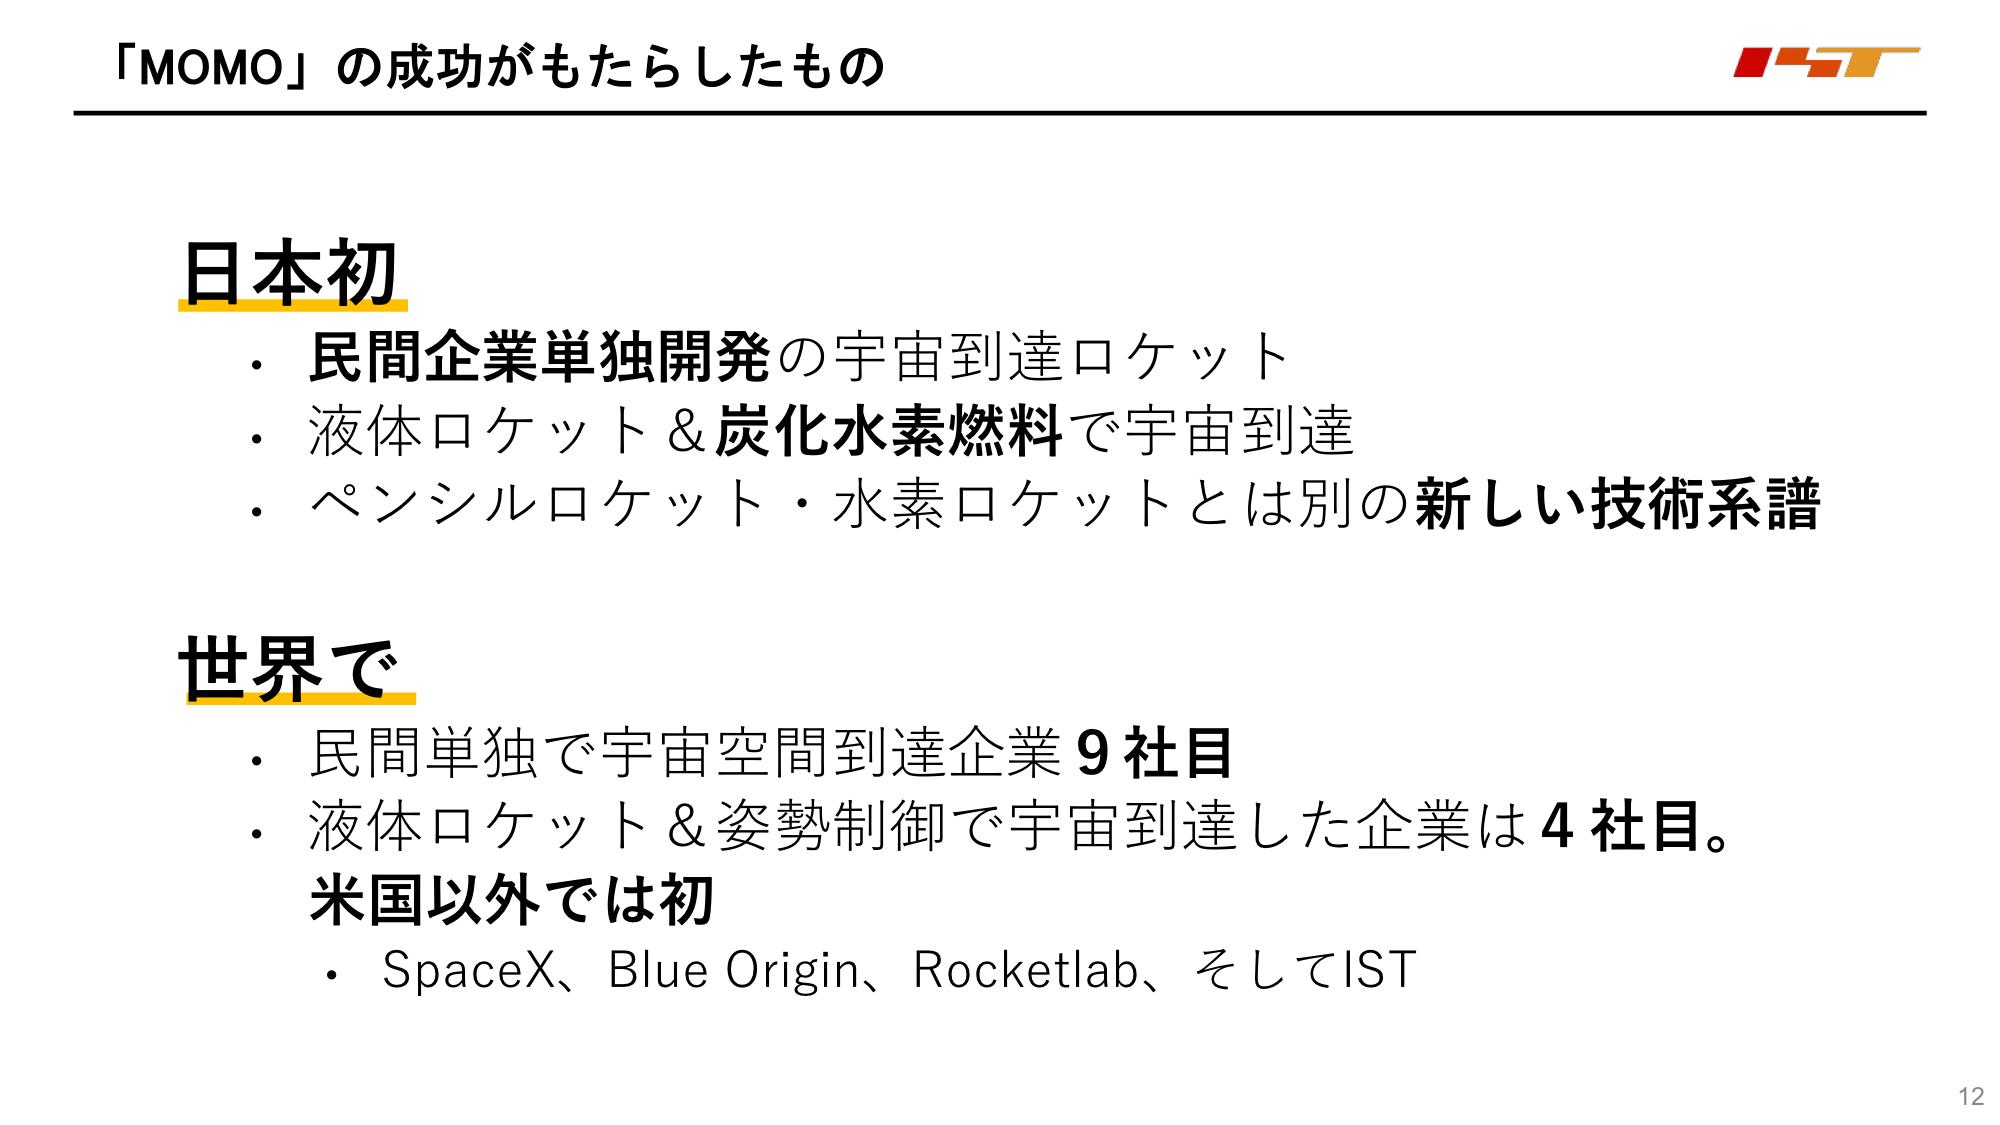 f:id:Imamura:20191126135110p:plain